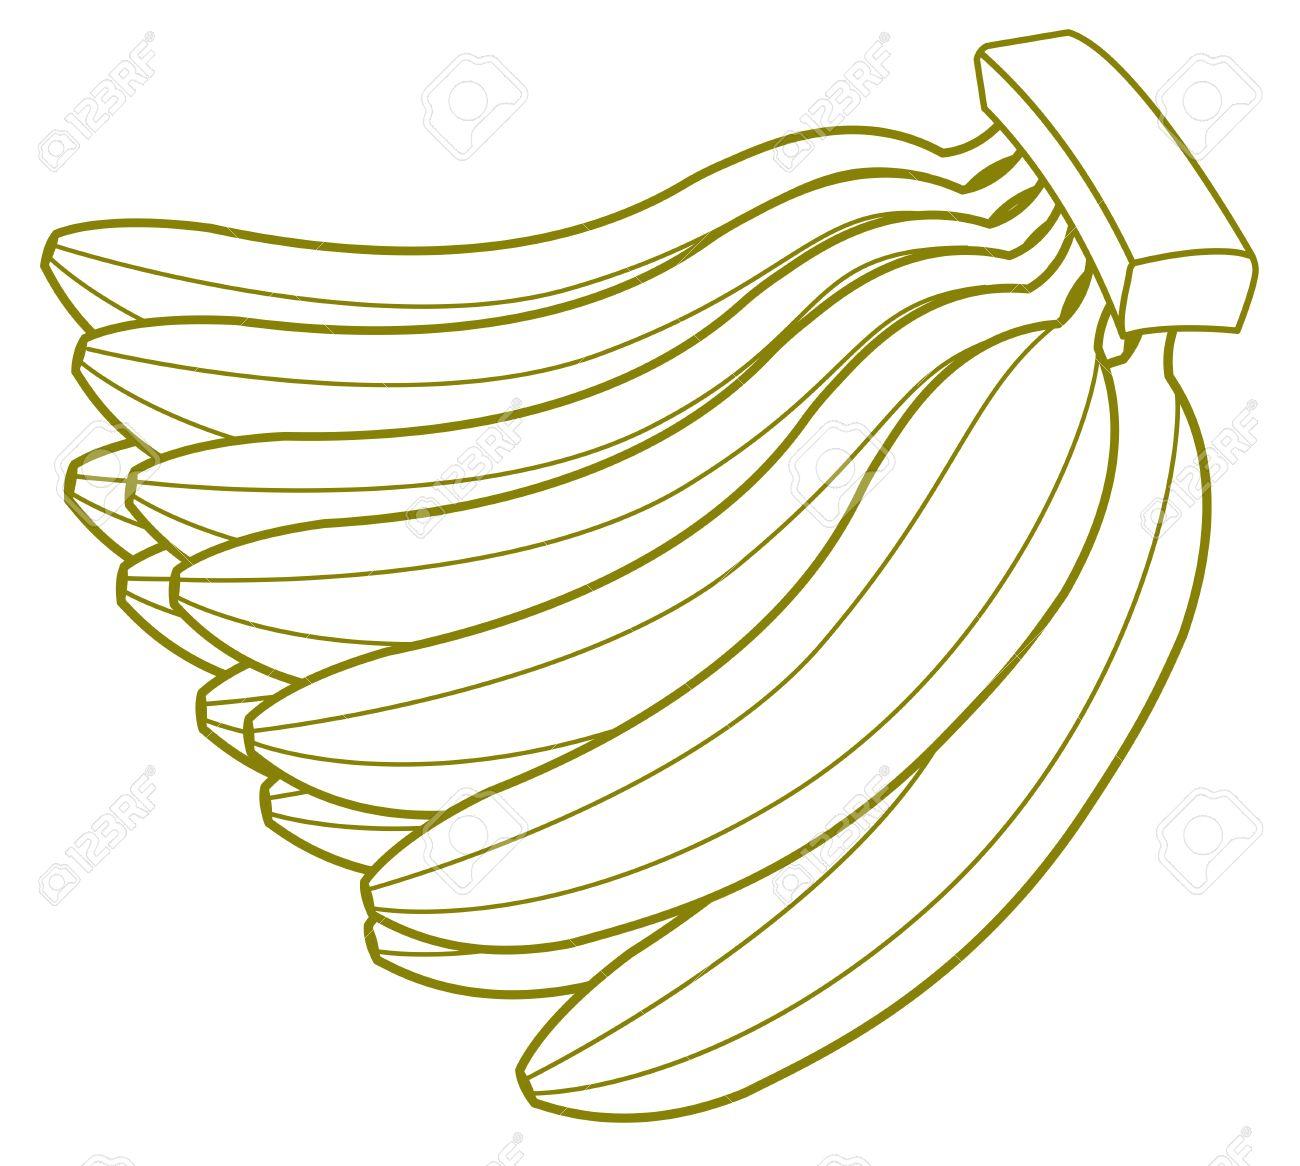 Bunch Of Bananas Drawing Stock Vector